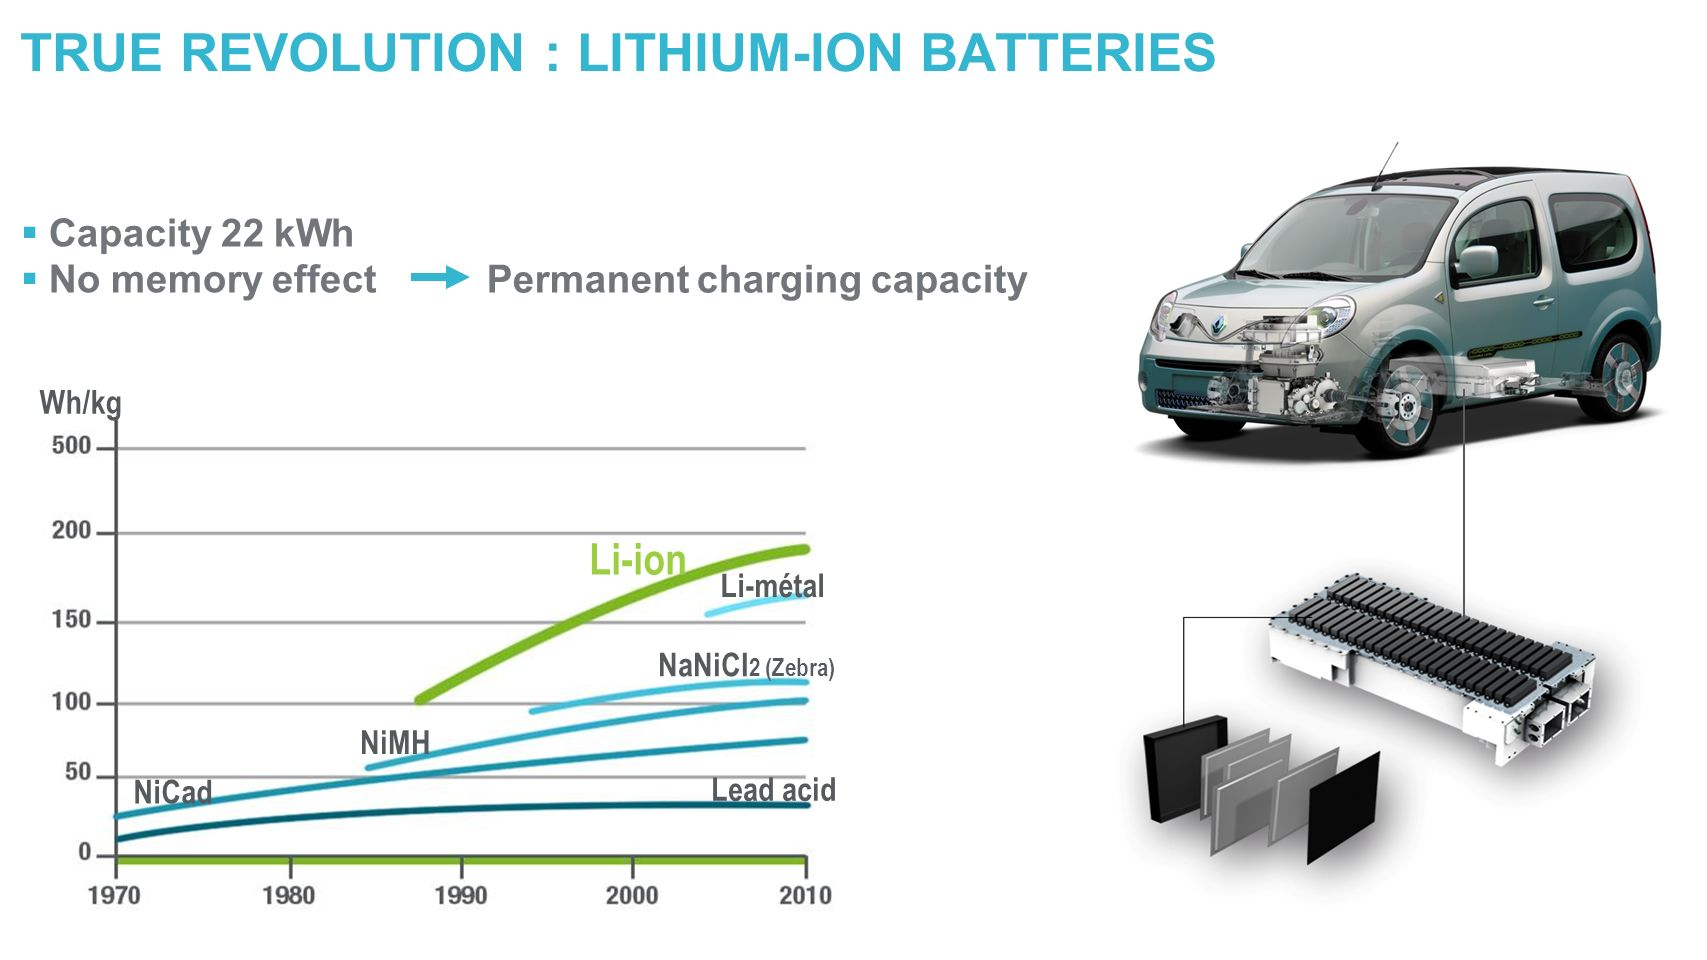 Wh/kg Li-ion Li-métal NaNiCI 2 (Zebra) Lead acid NiMH NiCad TRUE REVOLUTION : LITHIUM-ION BATTERIES Capacity 22 kWh No memory effect Permanent chargin